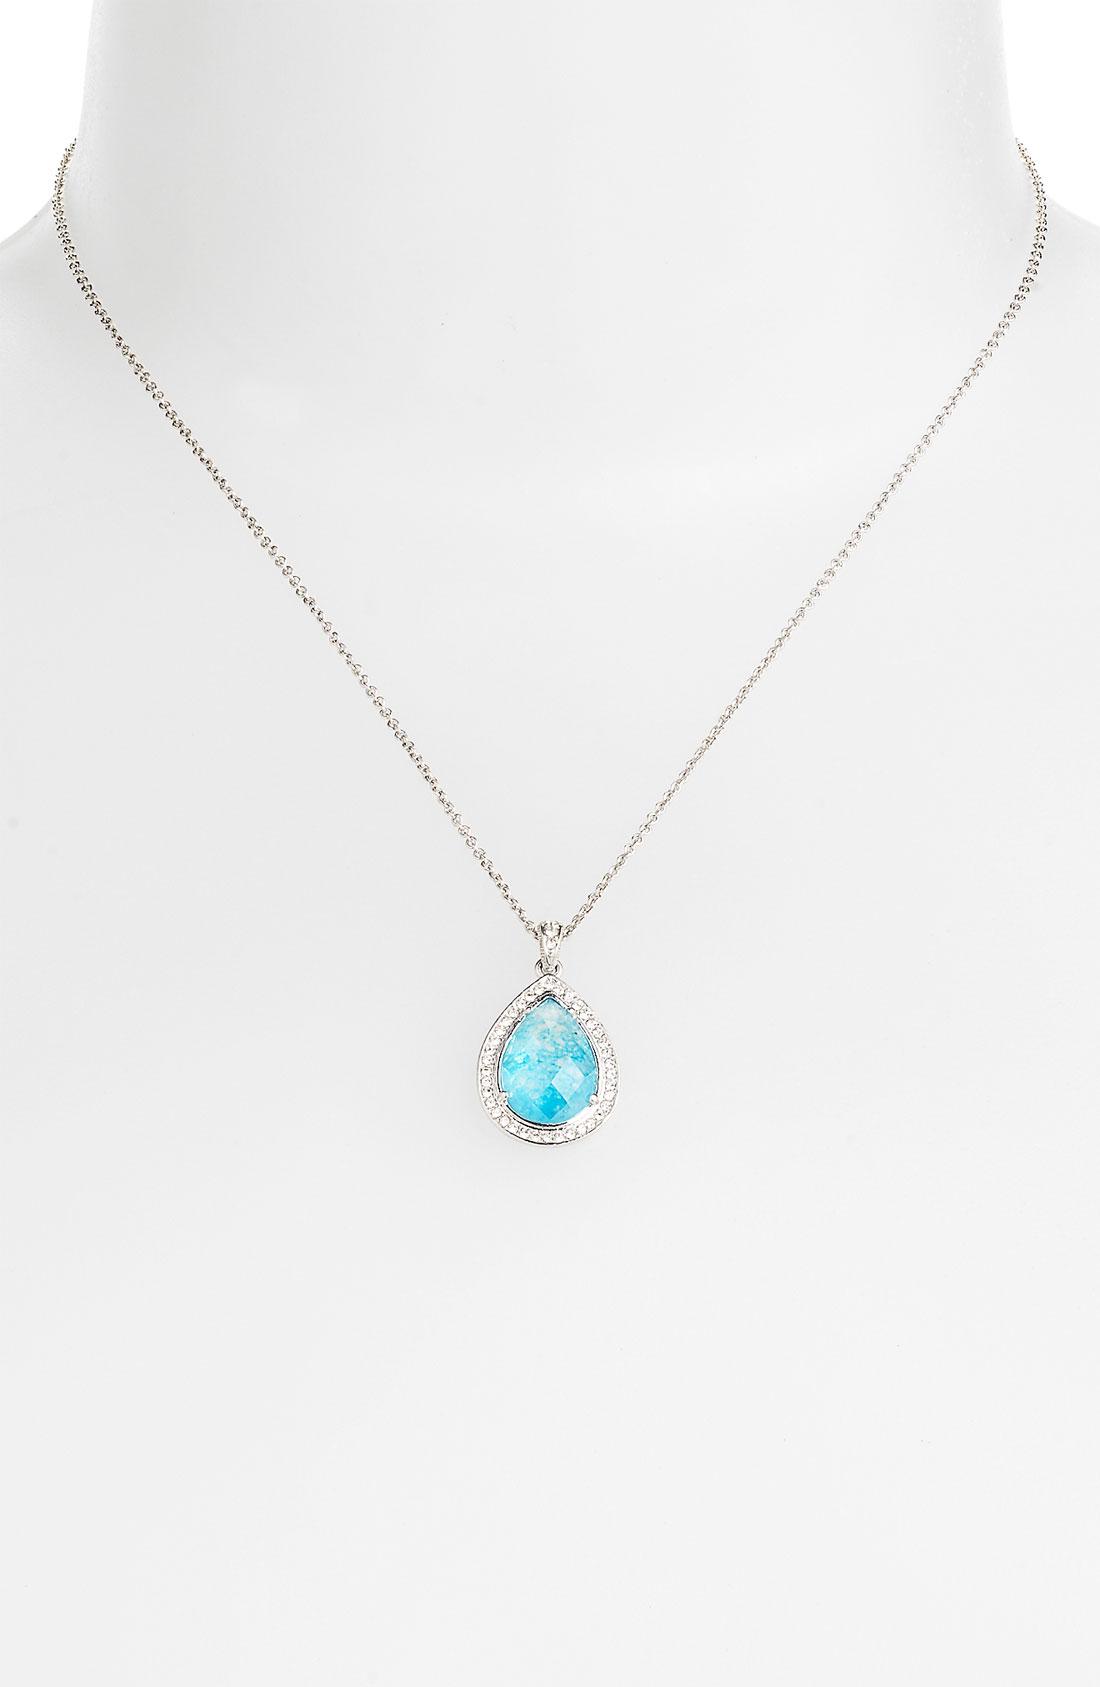 nadri boxed teardrop pendant necklace in blue turquoise